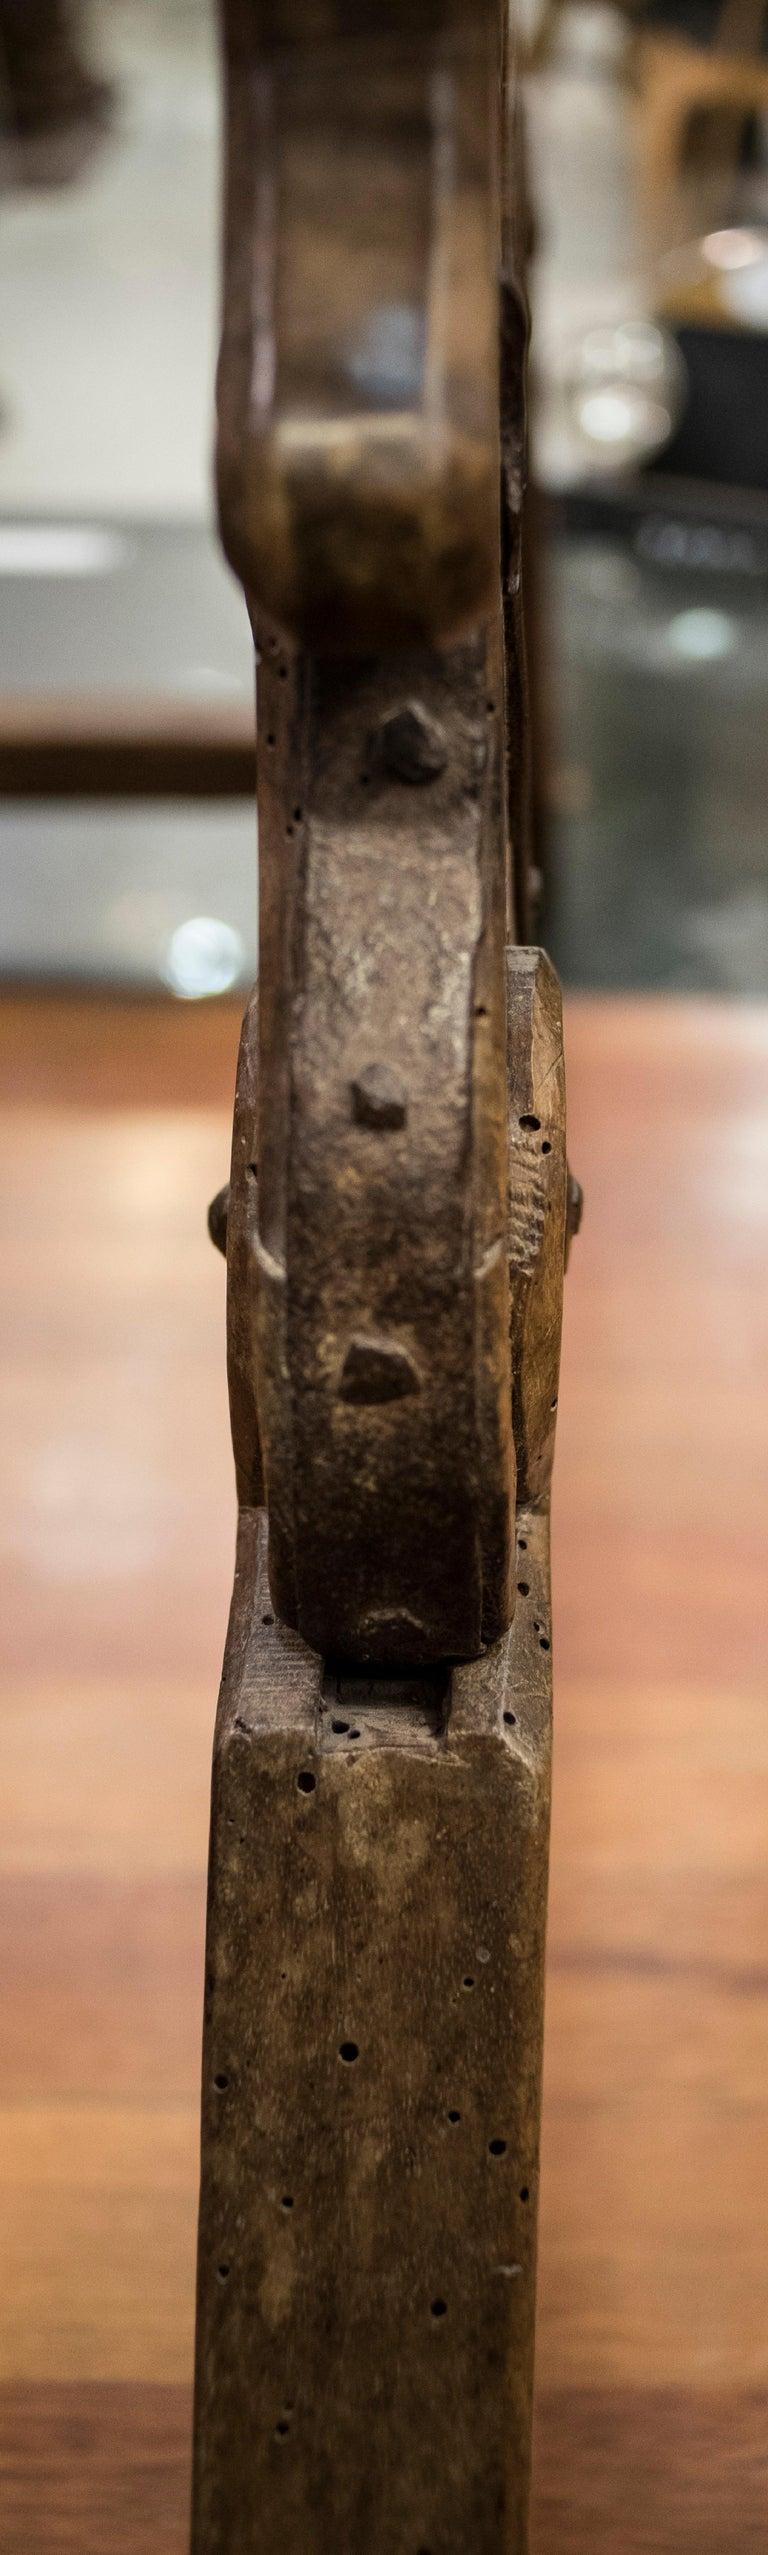 16th Century Spanish Walnut and Wrought Iron Dromedary Saddle For Sale 10